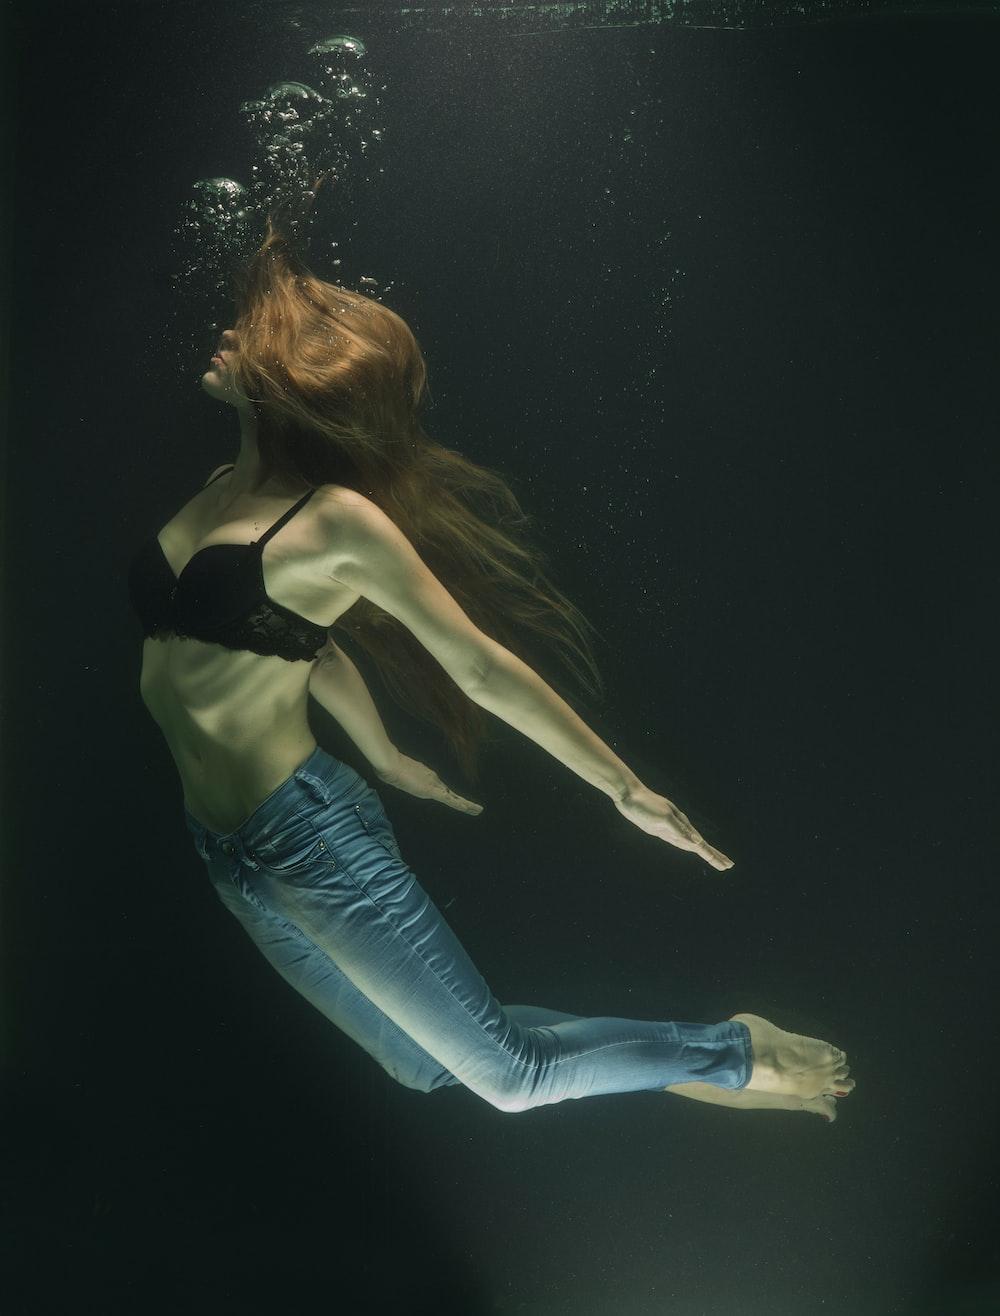 woman in black brassiere and blue denim jeans underwater